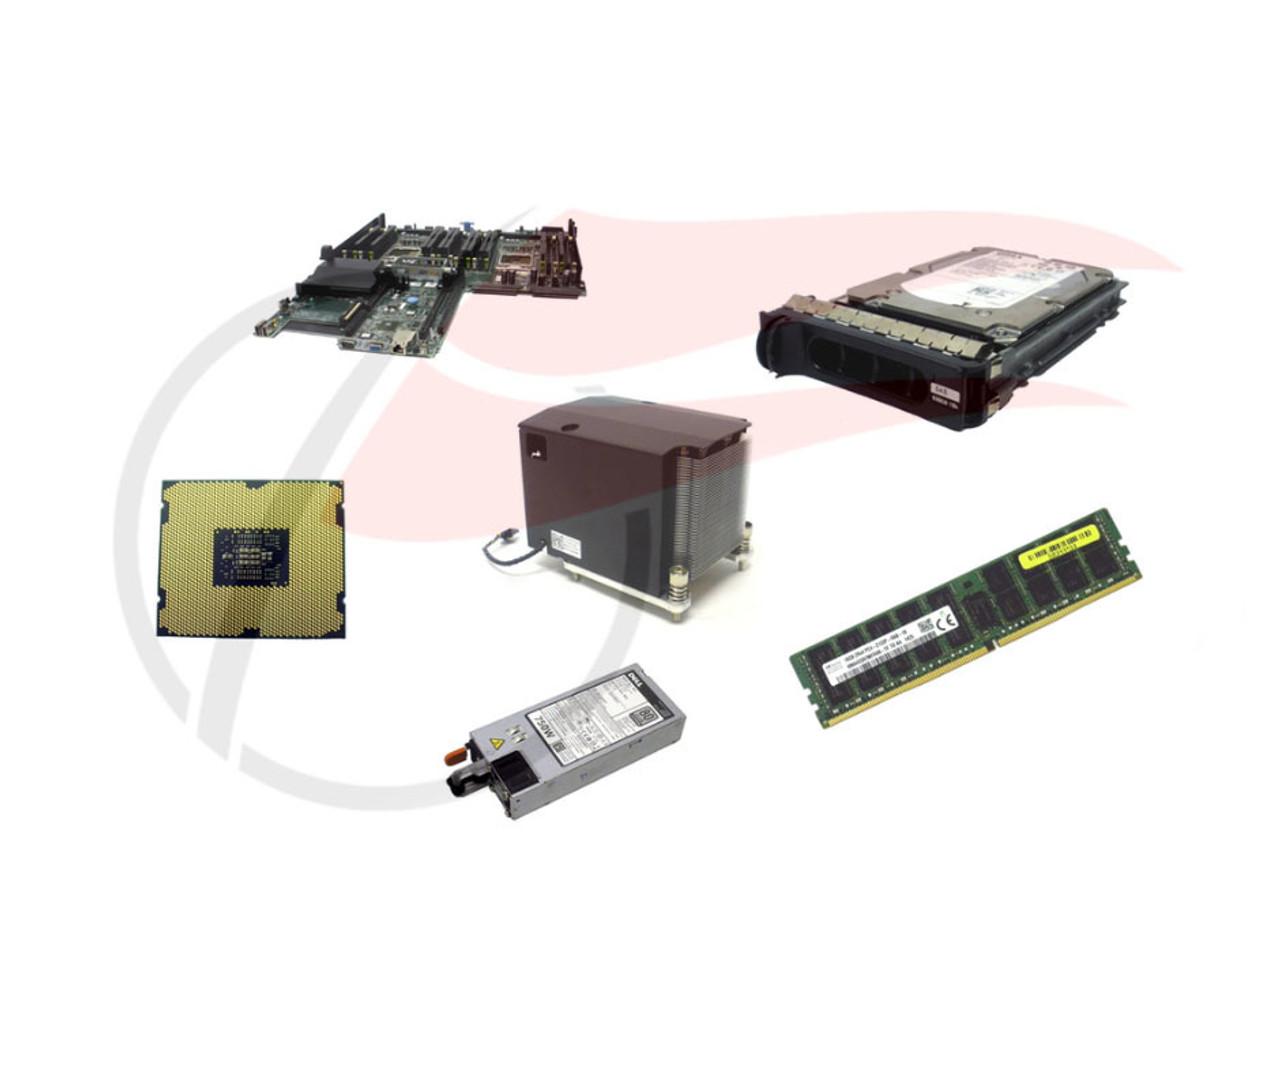 Dell PowerEdge R510 Spare Parts